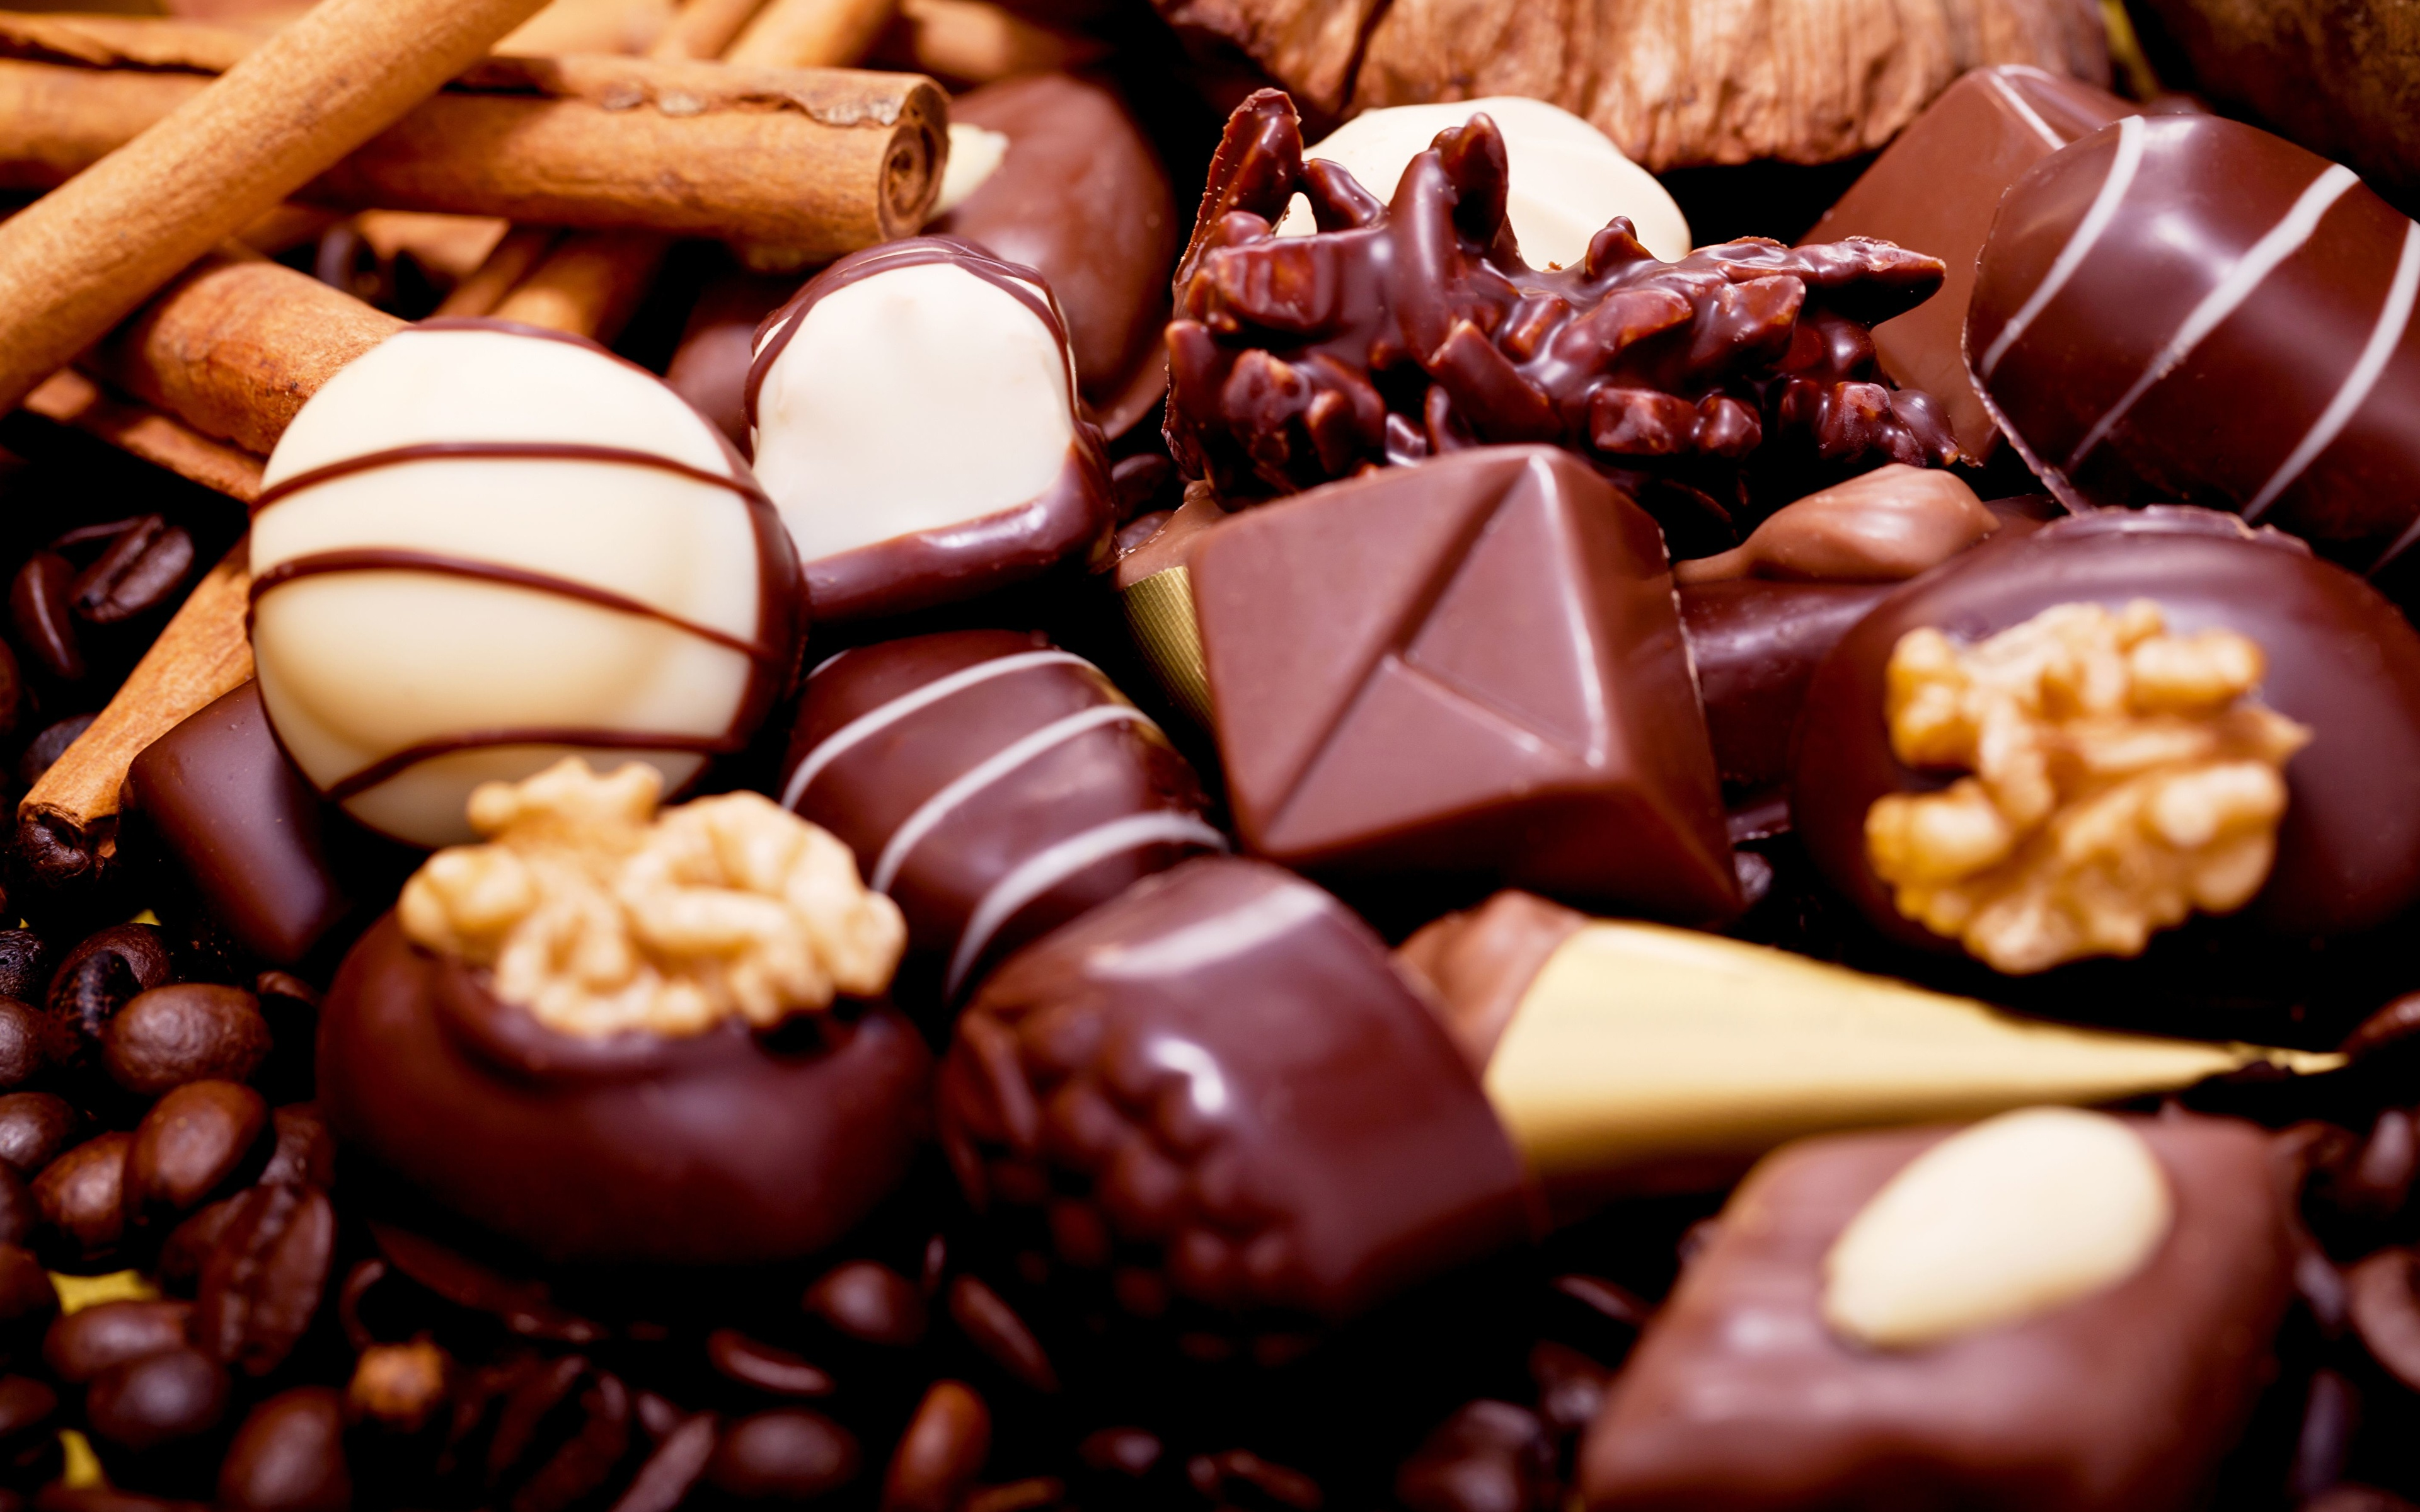 еда конфеты шоколад food candy chocolate без смс